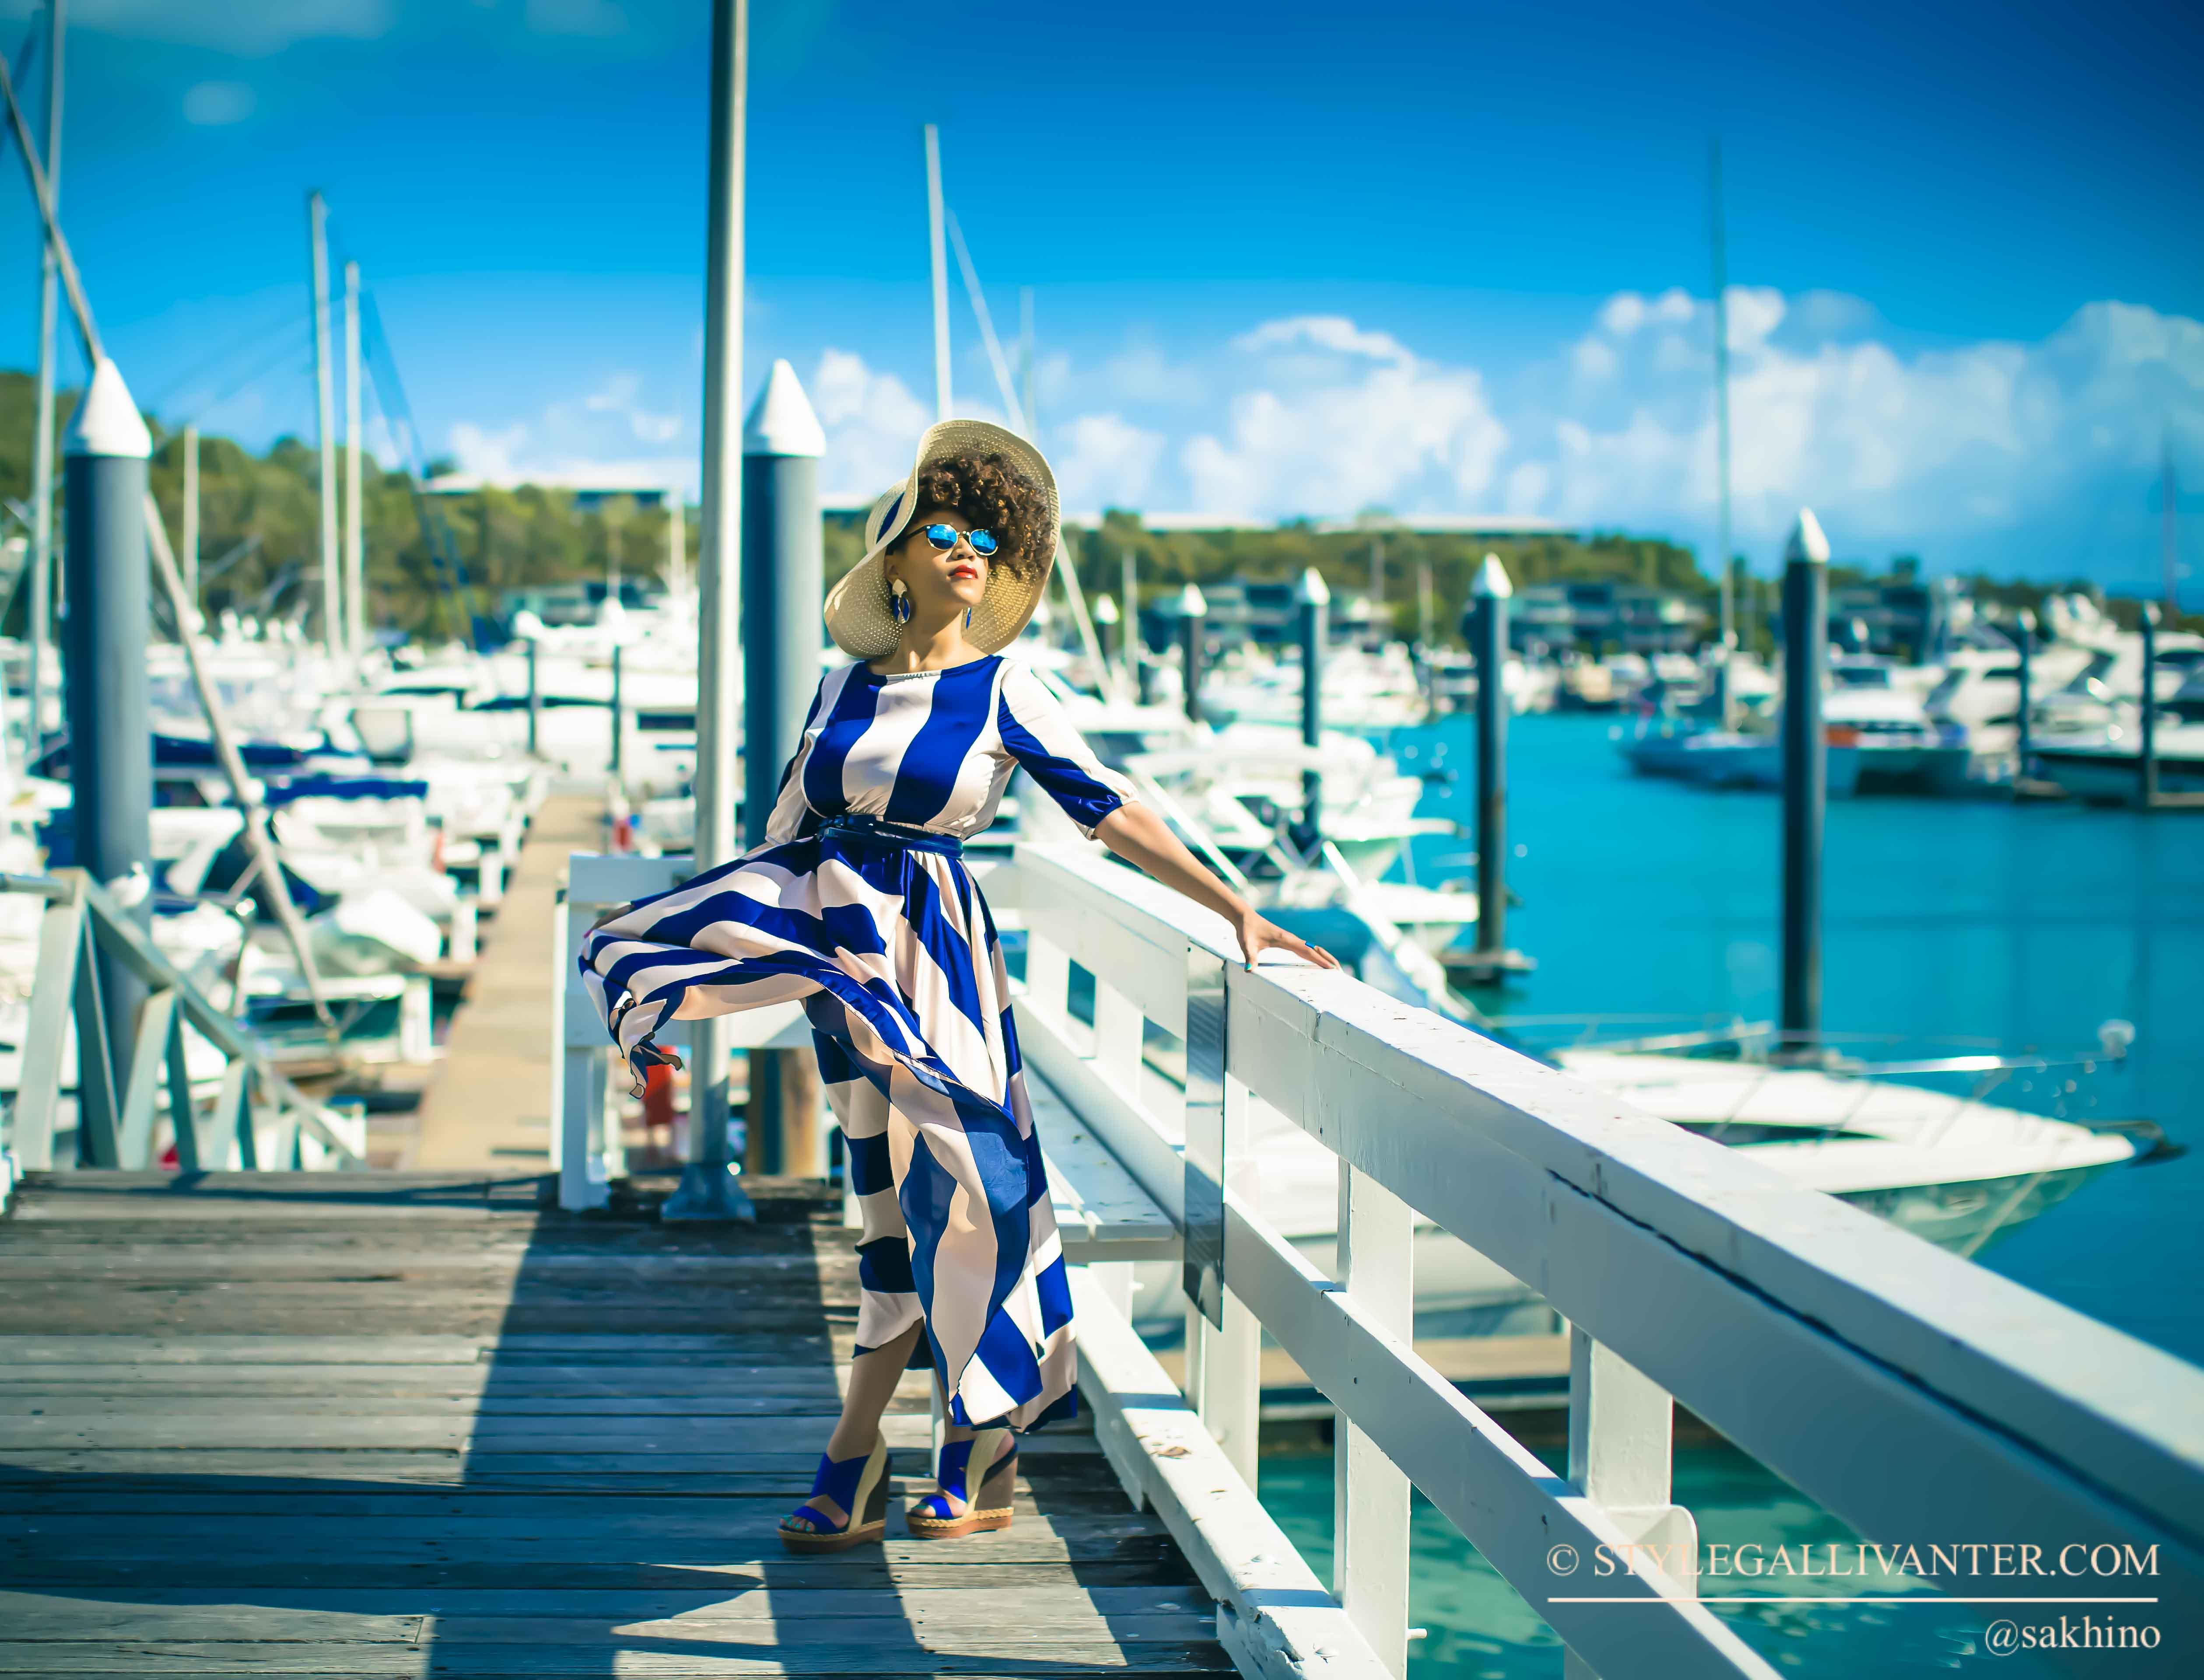 HAMILTON-ISLAND_TOP-AUSTRALIAN-DESTINATIONS_STYLEGALLIVANTER_MIRANDA-SAKHINO_sakhino_magazine-cover-december-2015_summer-2015-editorials_australia's-top-fashion-bloggers-12